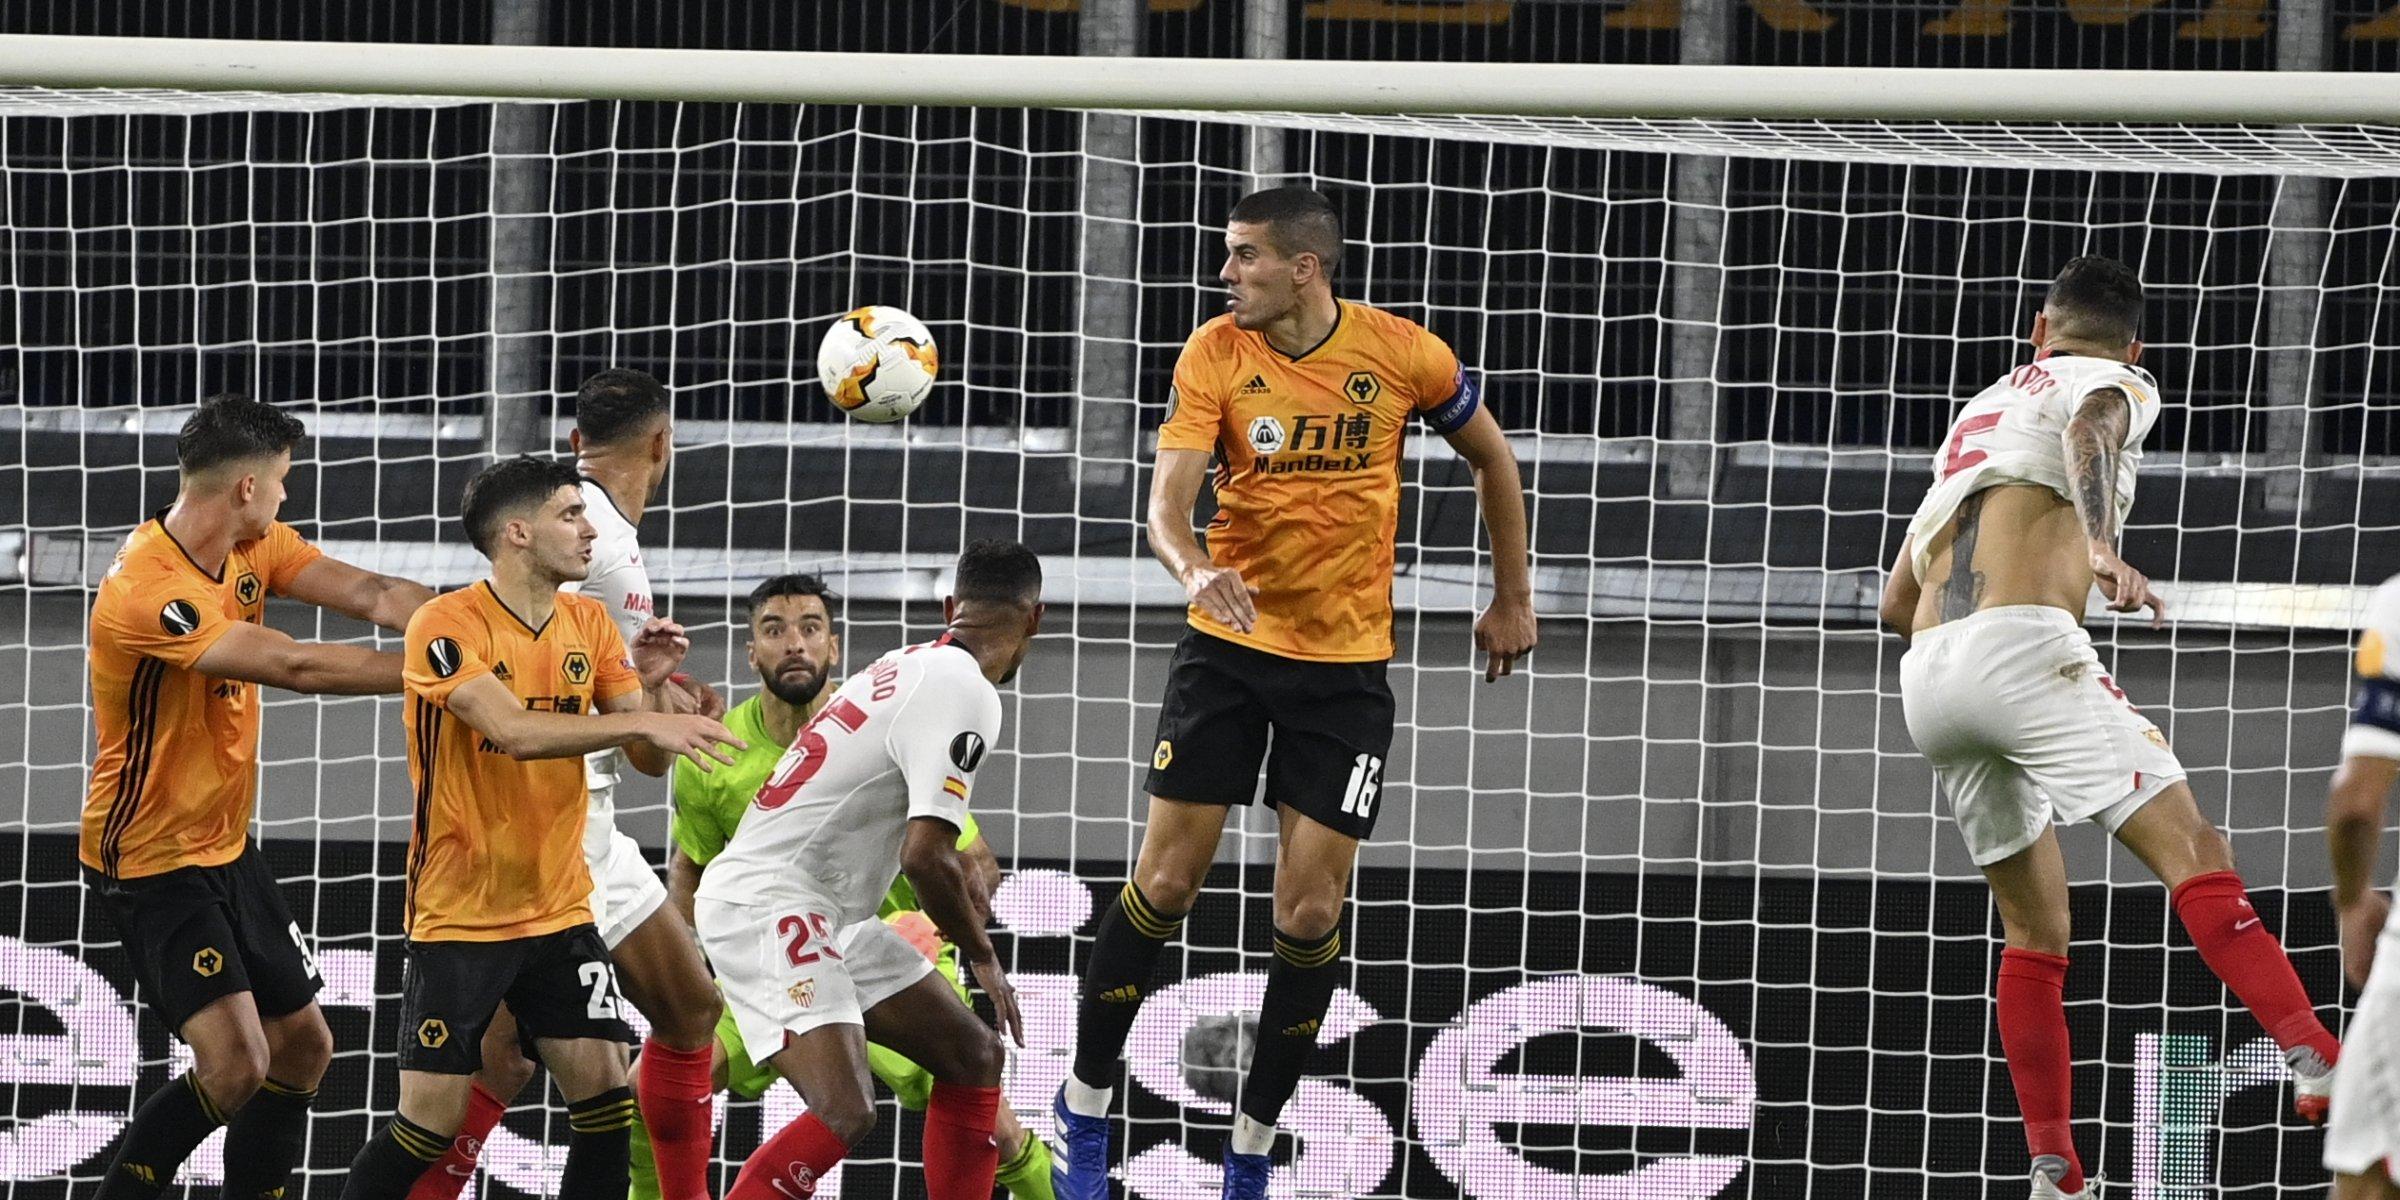 sevilla shakhtar reach europa league semifinals daily sabah sevilla shakhtar reach europa league